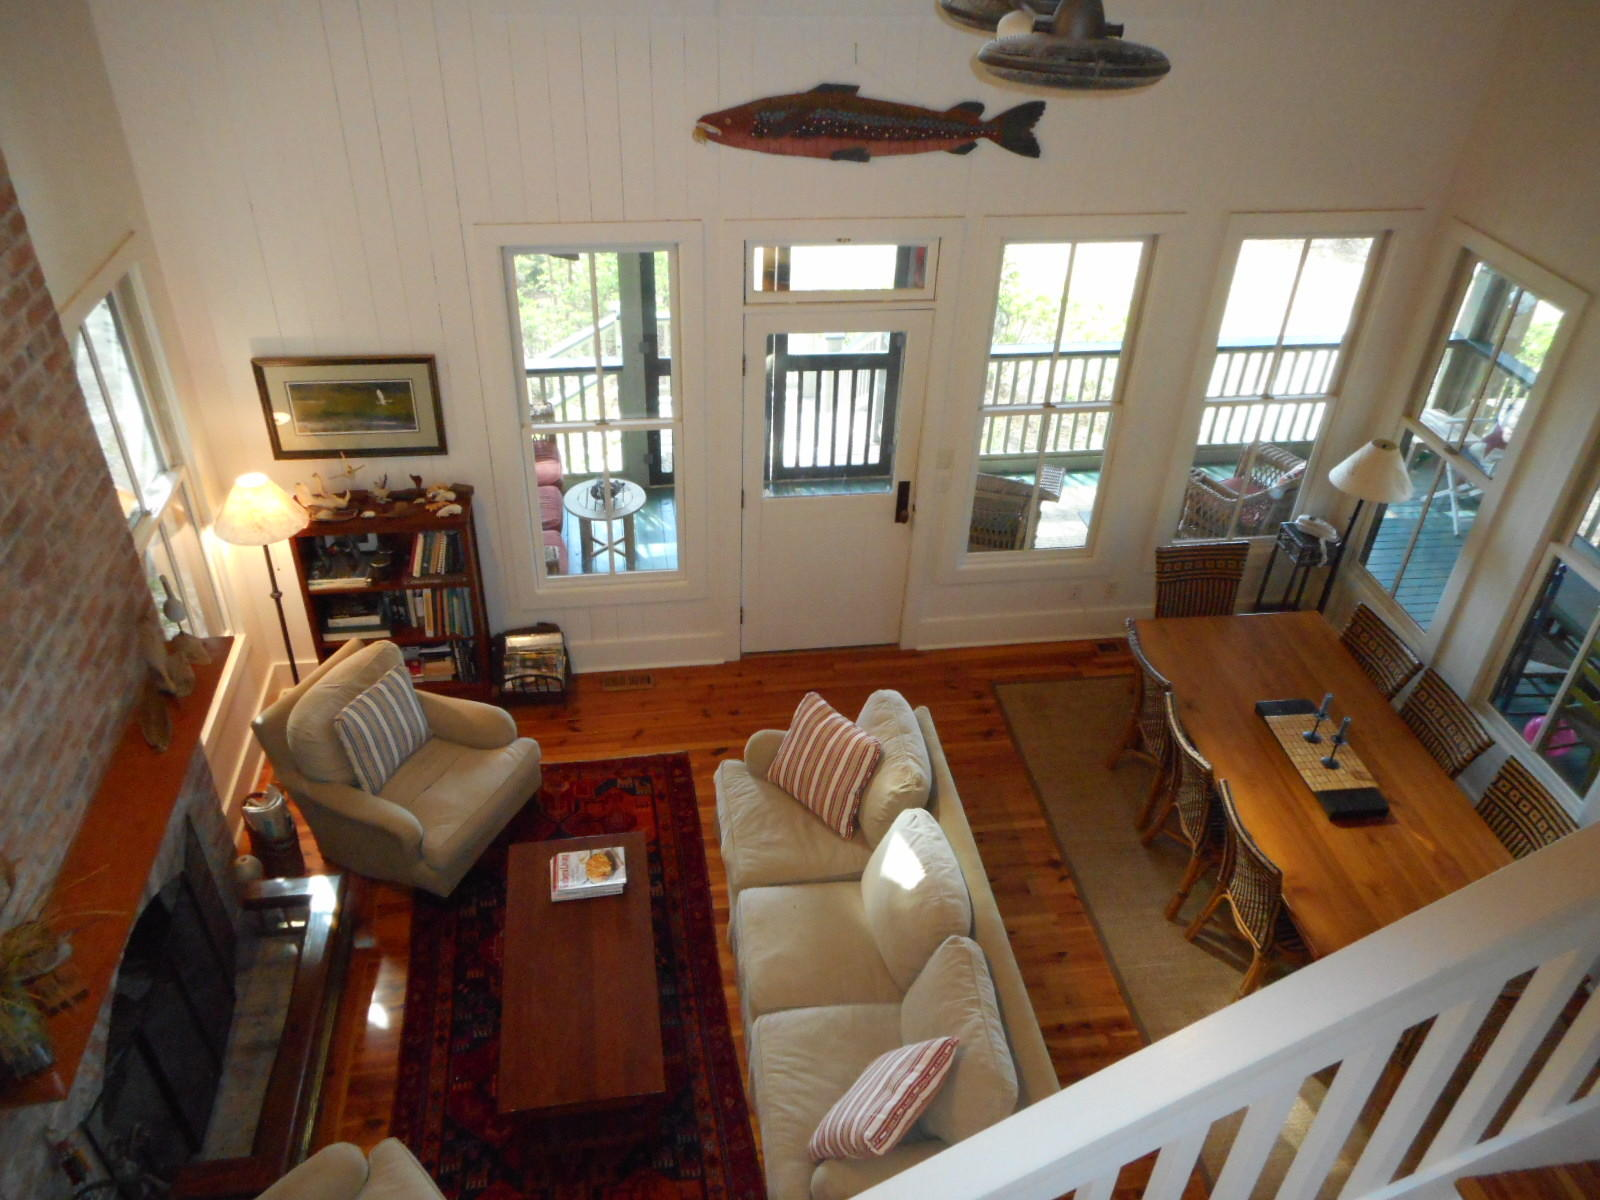 Bailey Island Club Homes For Sale - 2145 Bailey Island, Edisto Island, SC - 1